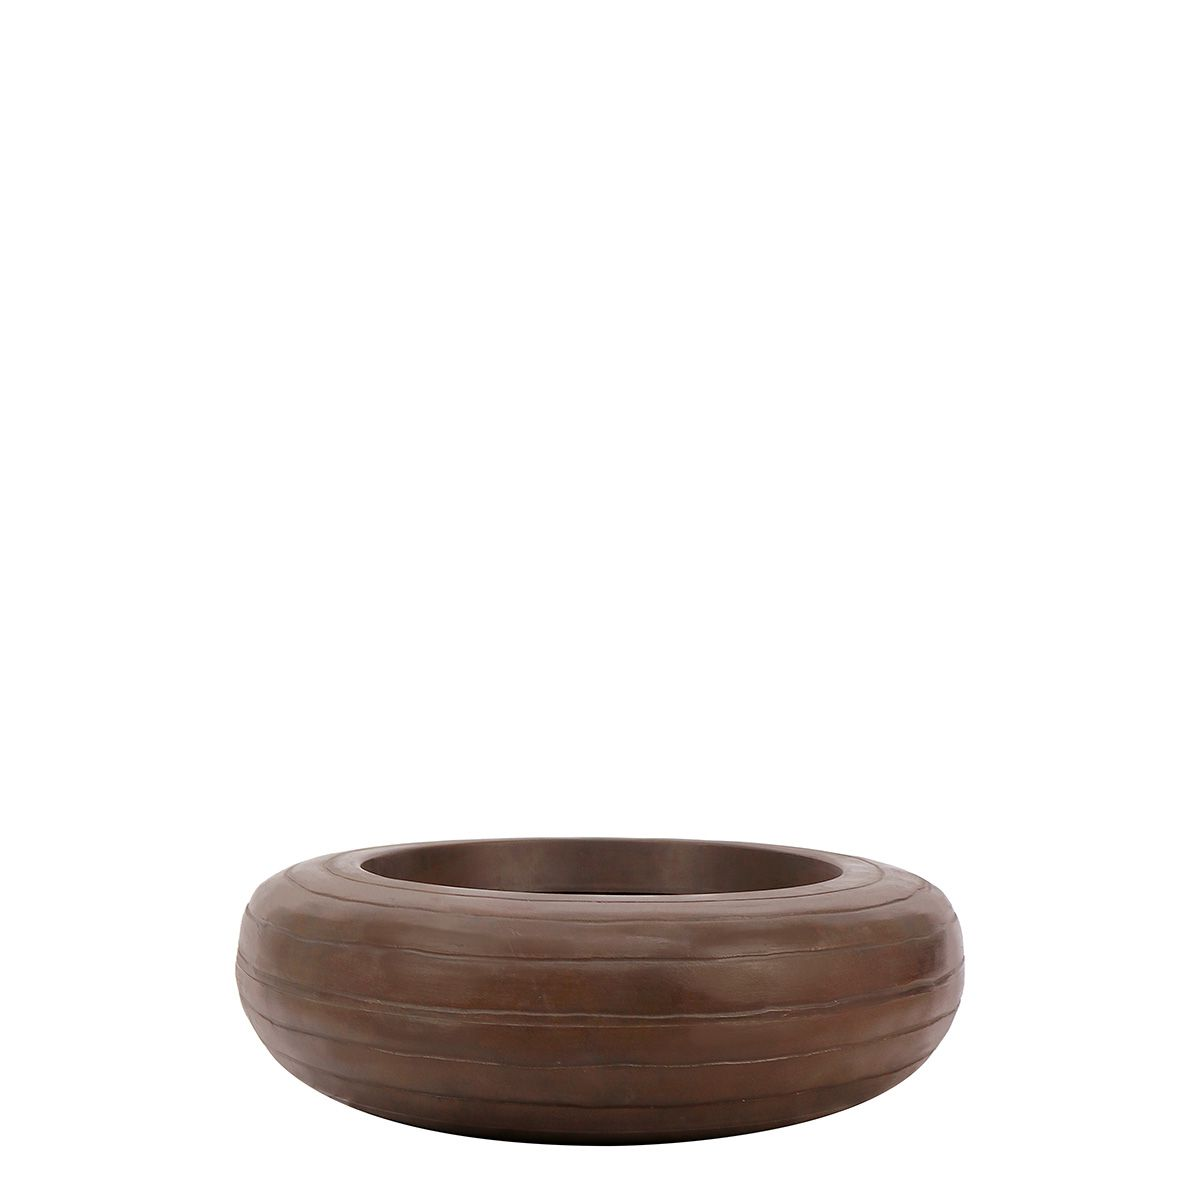 Vaso Relevo Bowl 35 / 55 x 16 cm - VASART